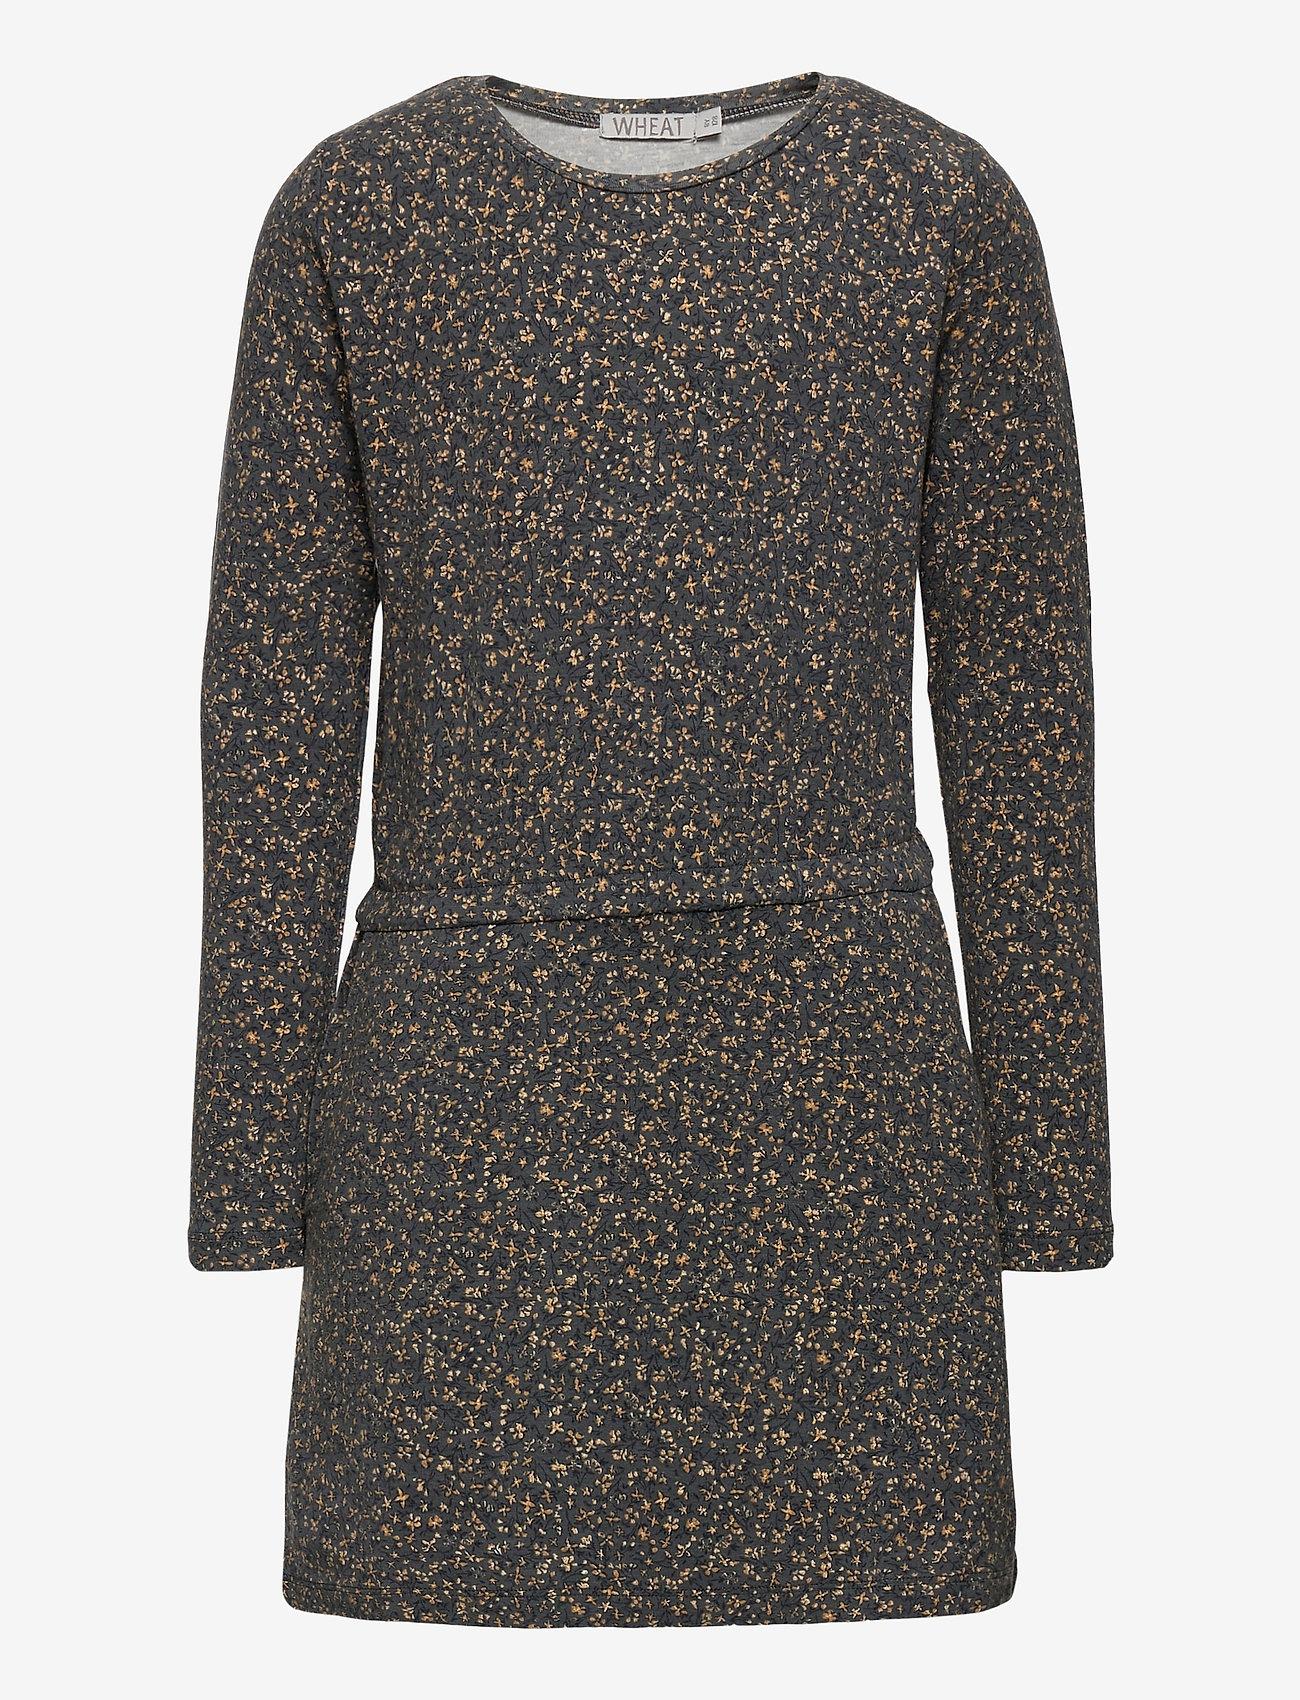 Wheat - Dress Odile - kleider - greyblue flowers - 0